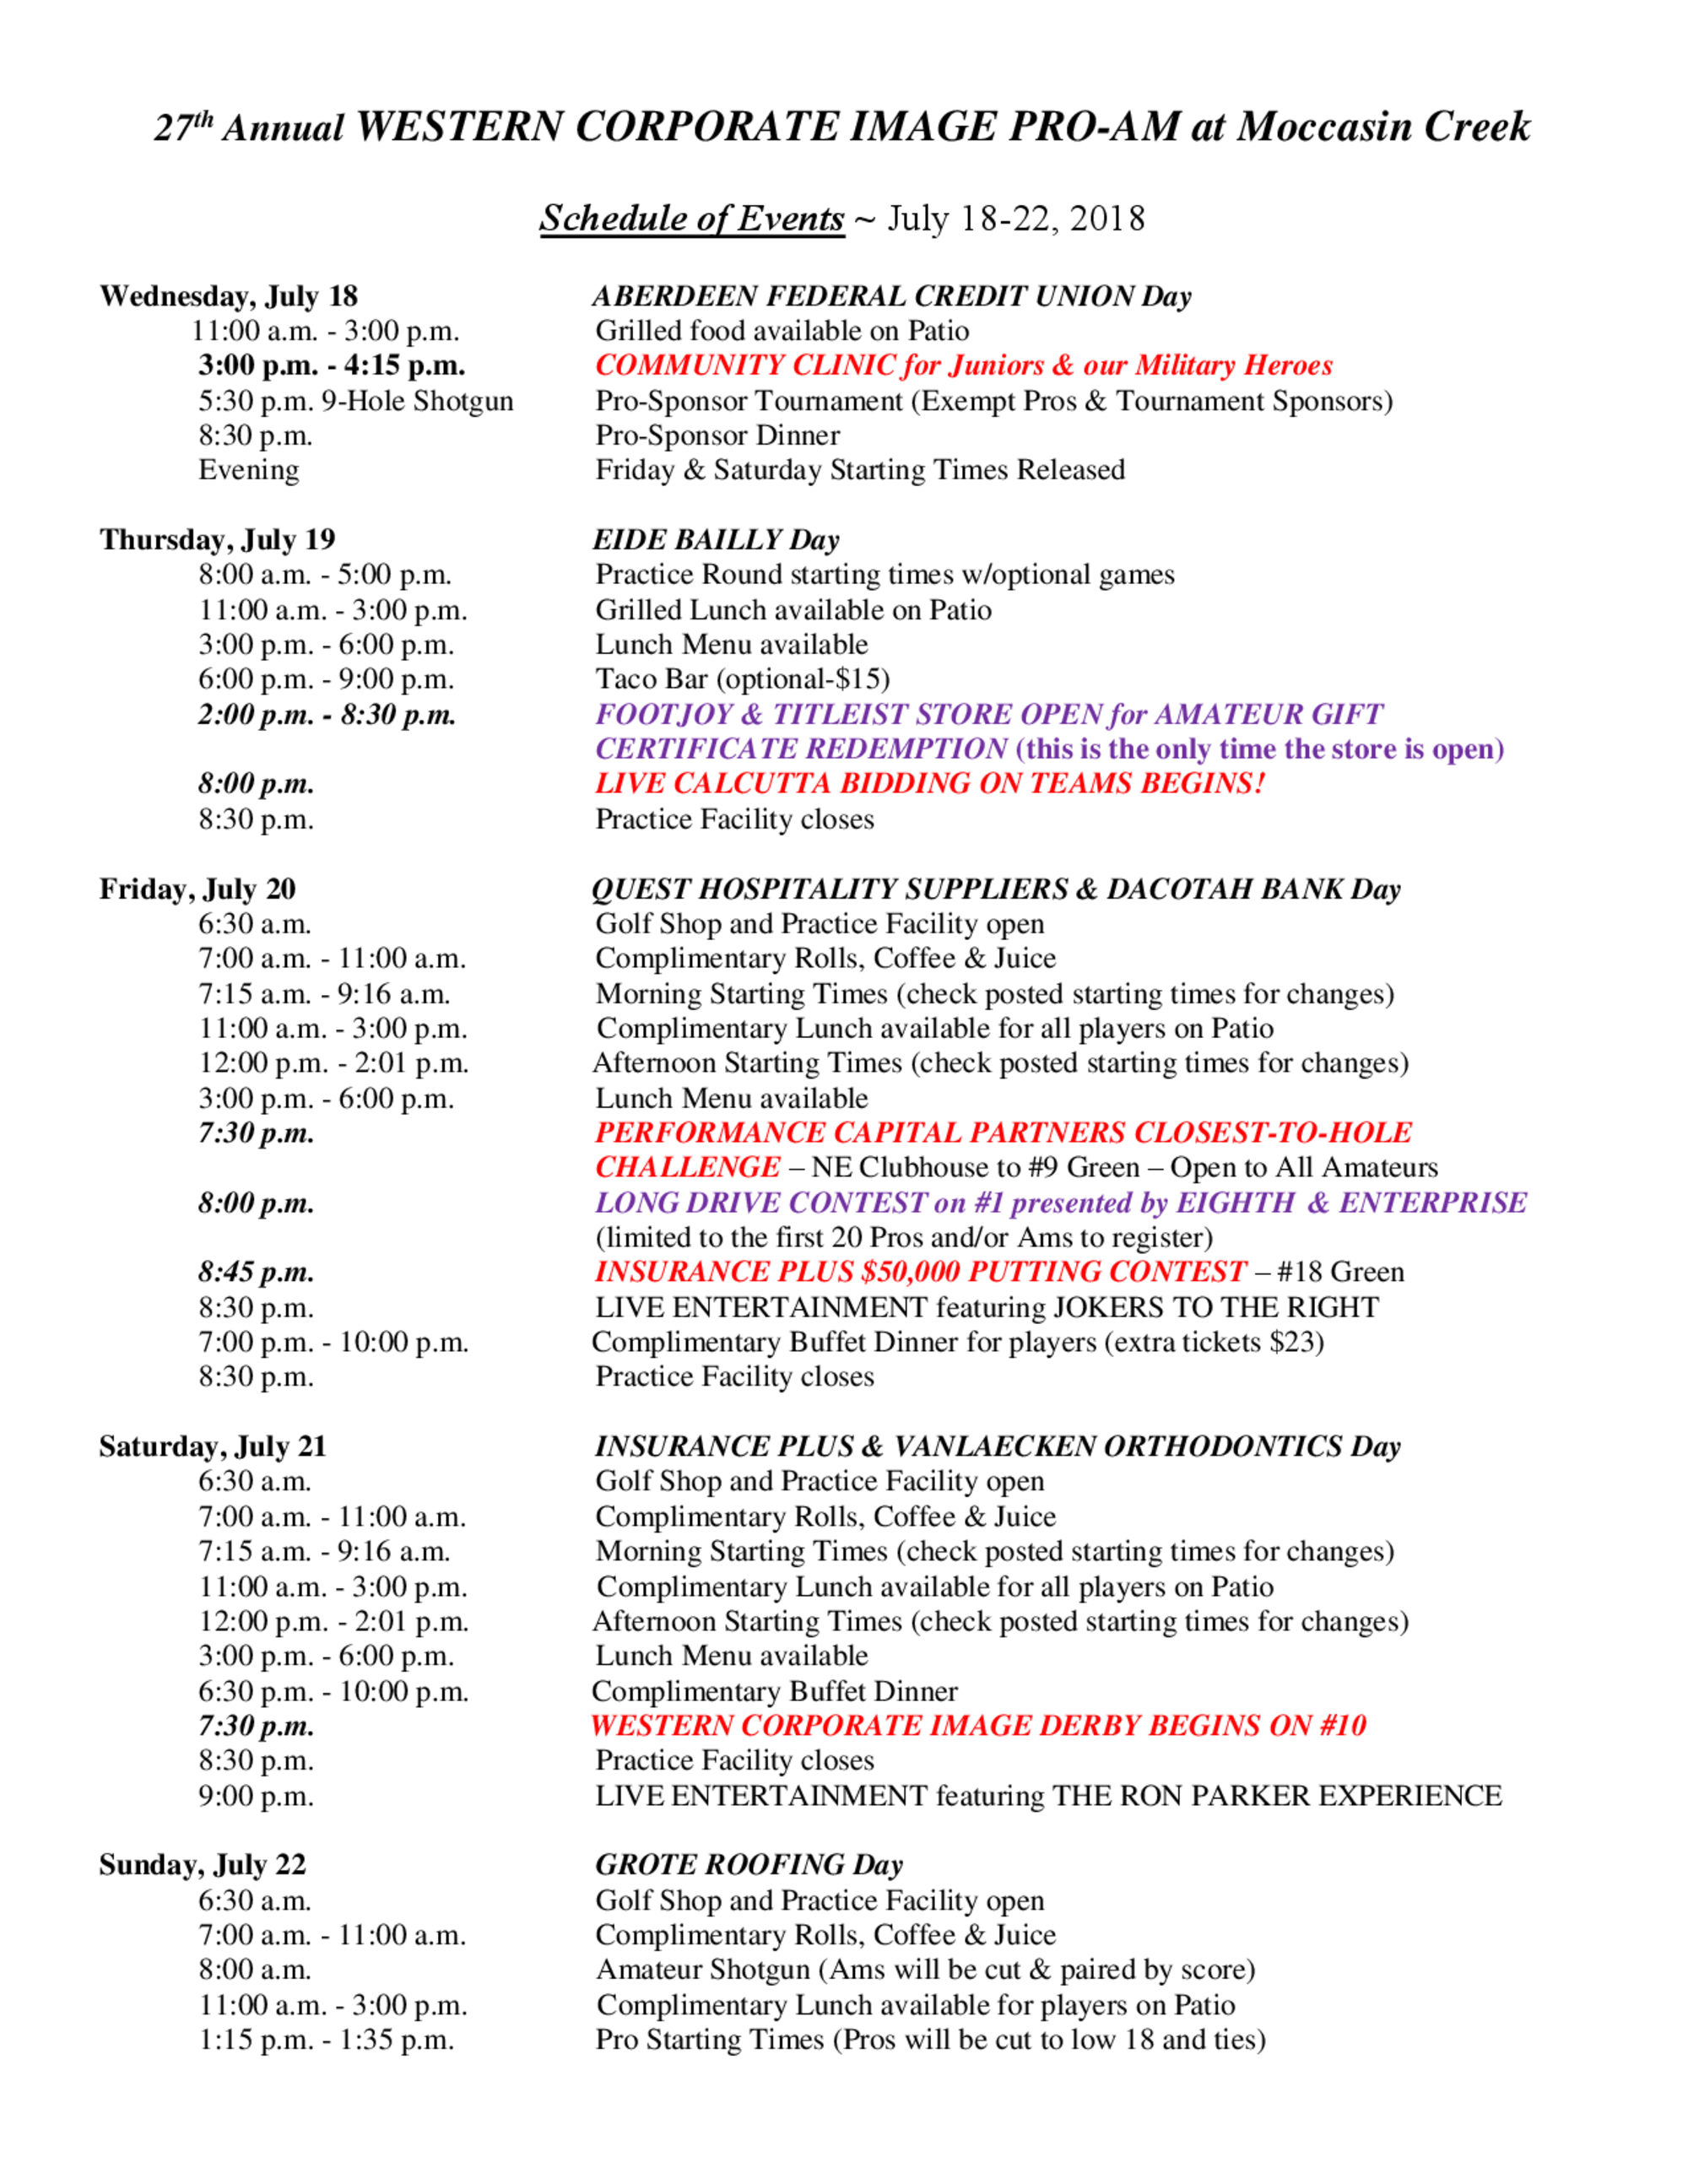 2018 schedule of events 1